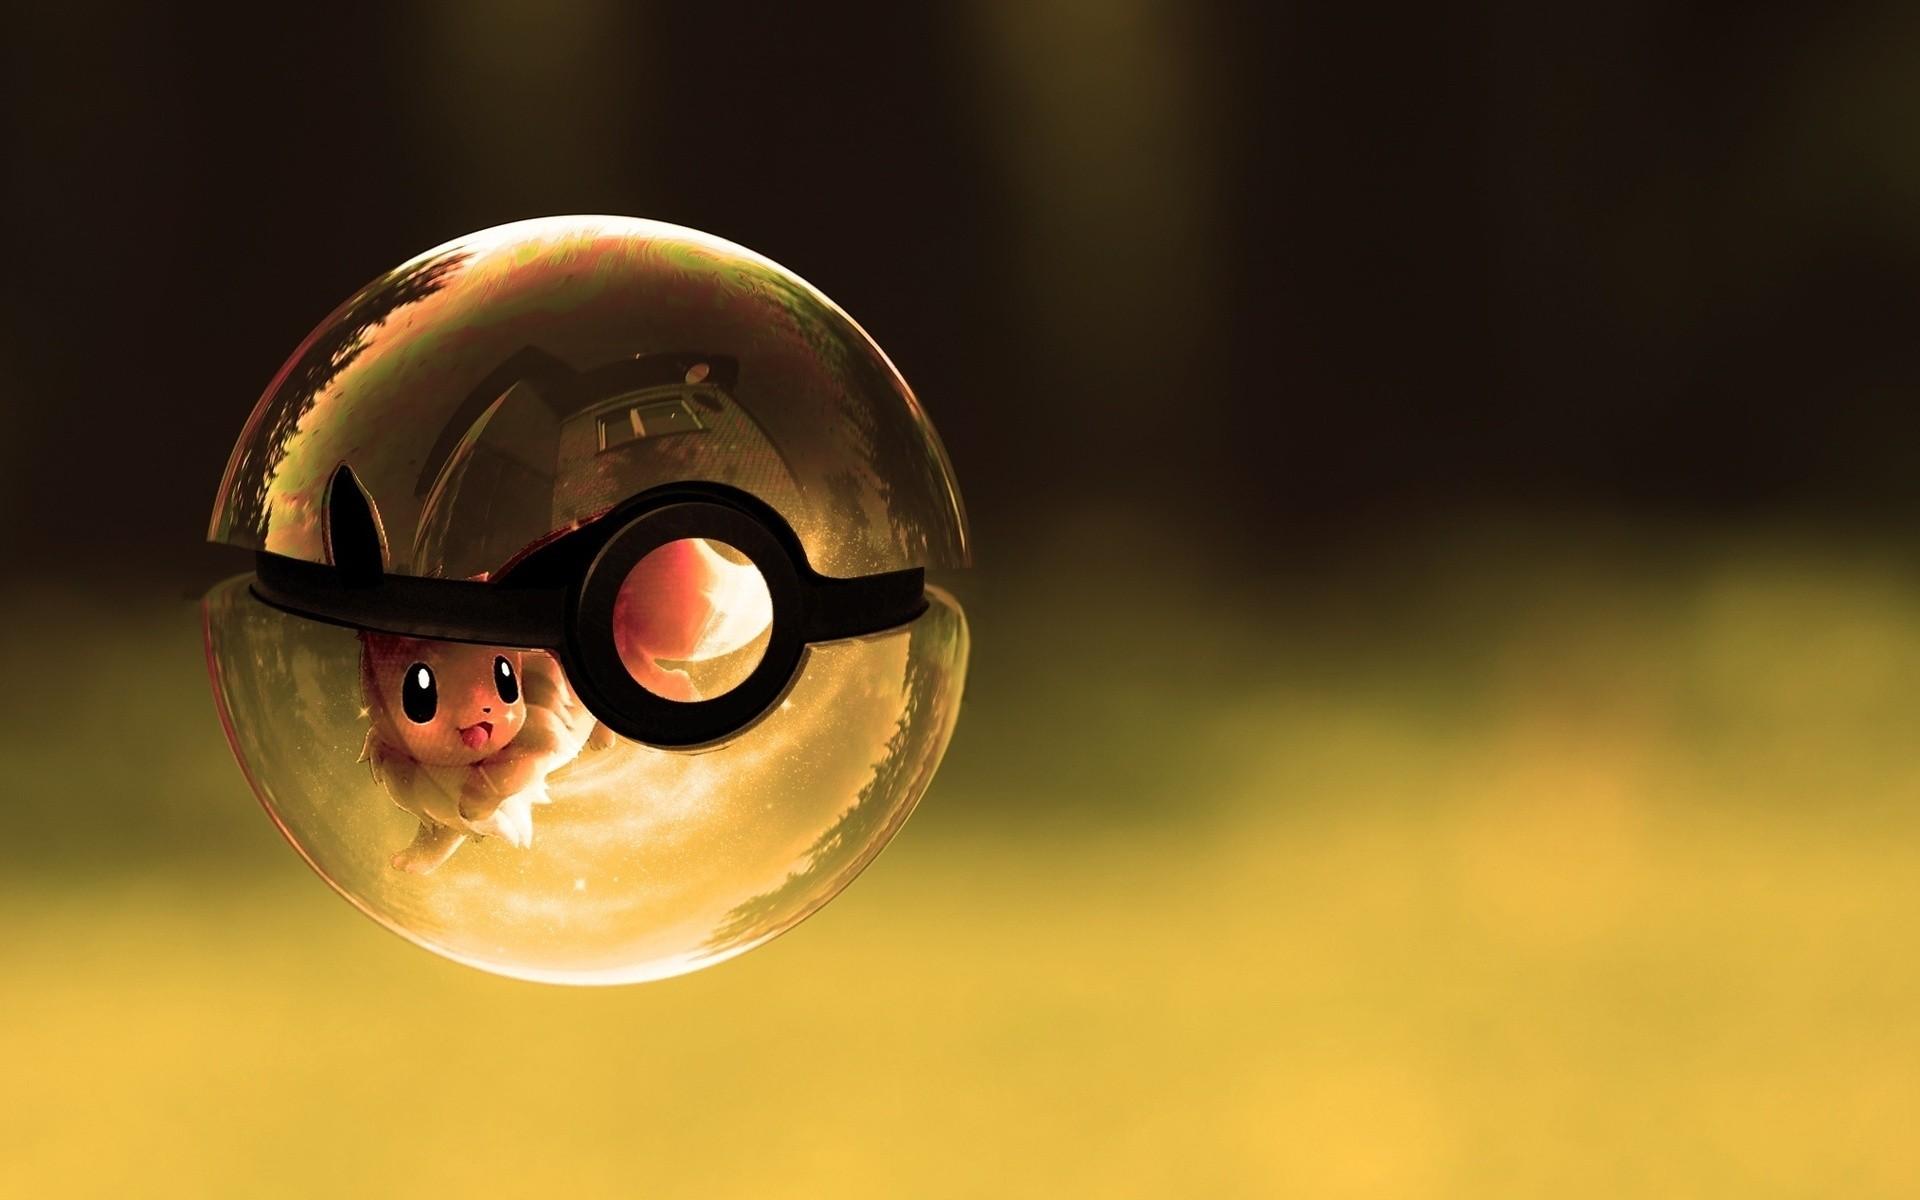 Pokemon poke balls eevee artwork wallpaper 1920x1200 1920x1200